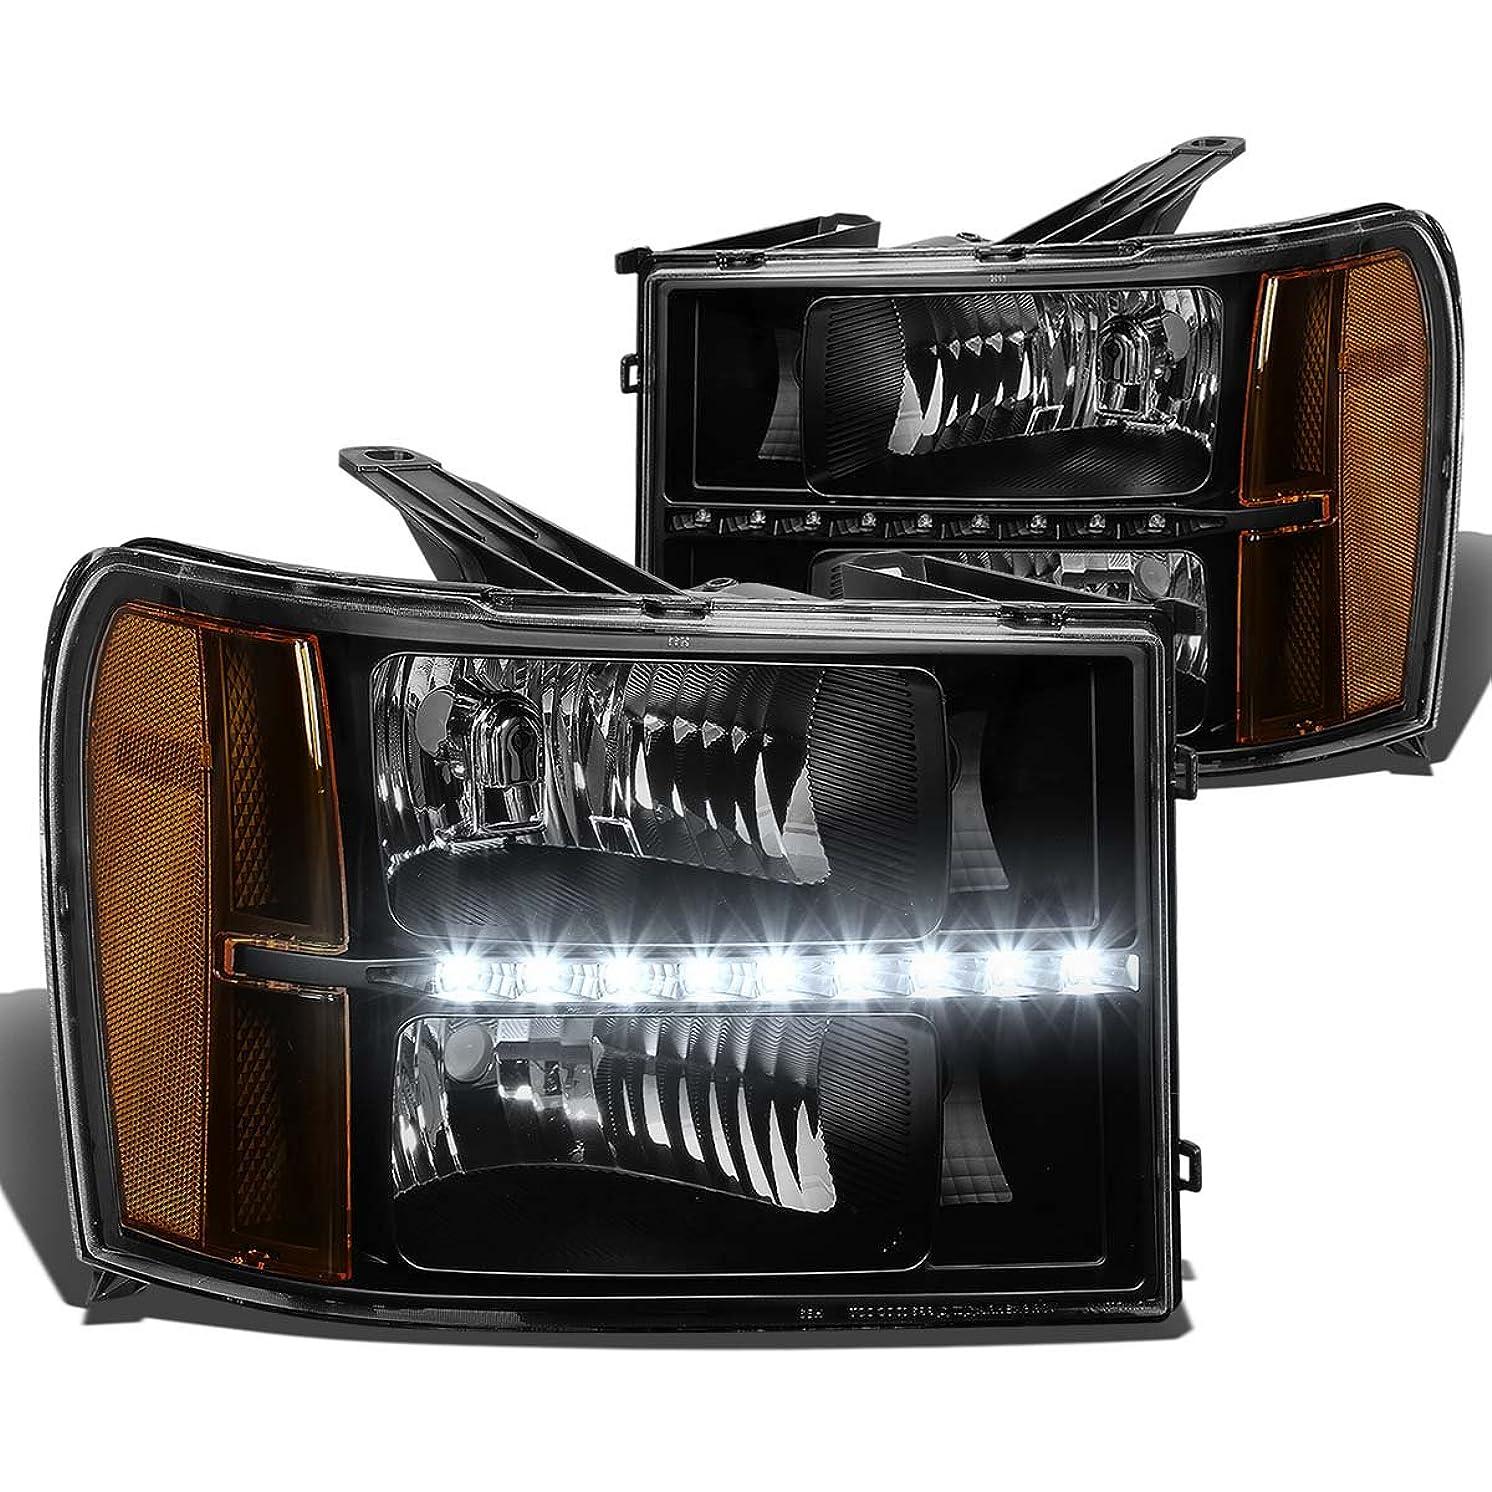 DNA Motoring HL-LED-GMCSIE07-BK-AM Headlight Assembly (Driver and Passenger Side) wqmqanmkwr3937